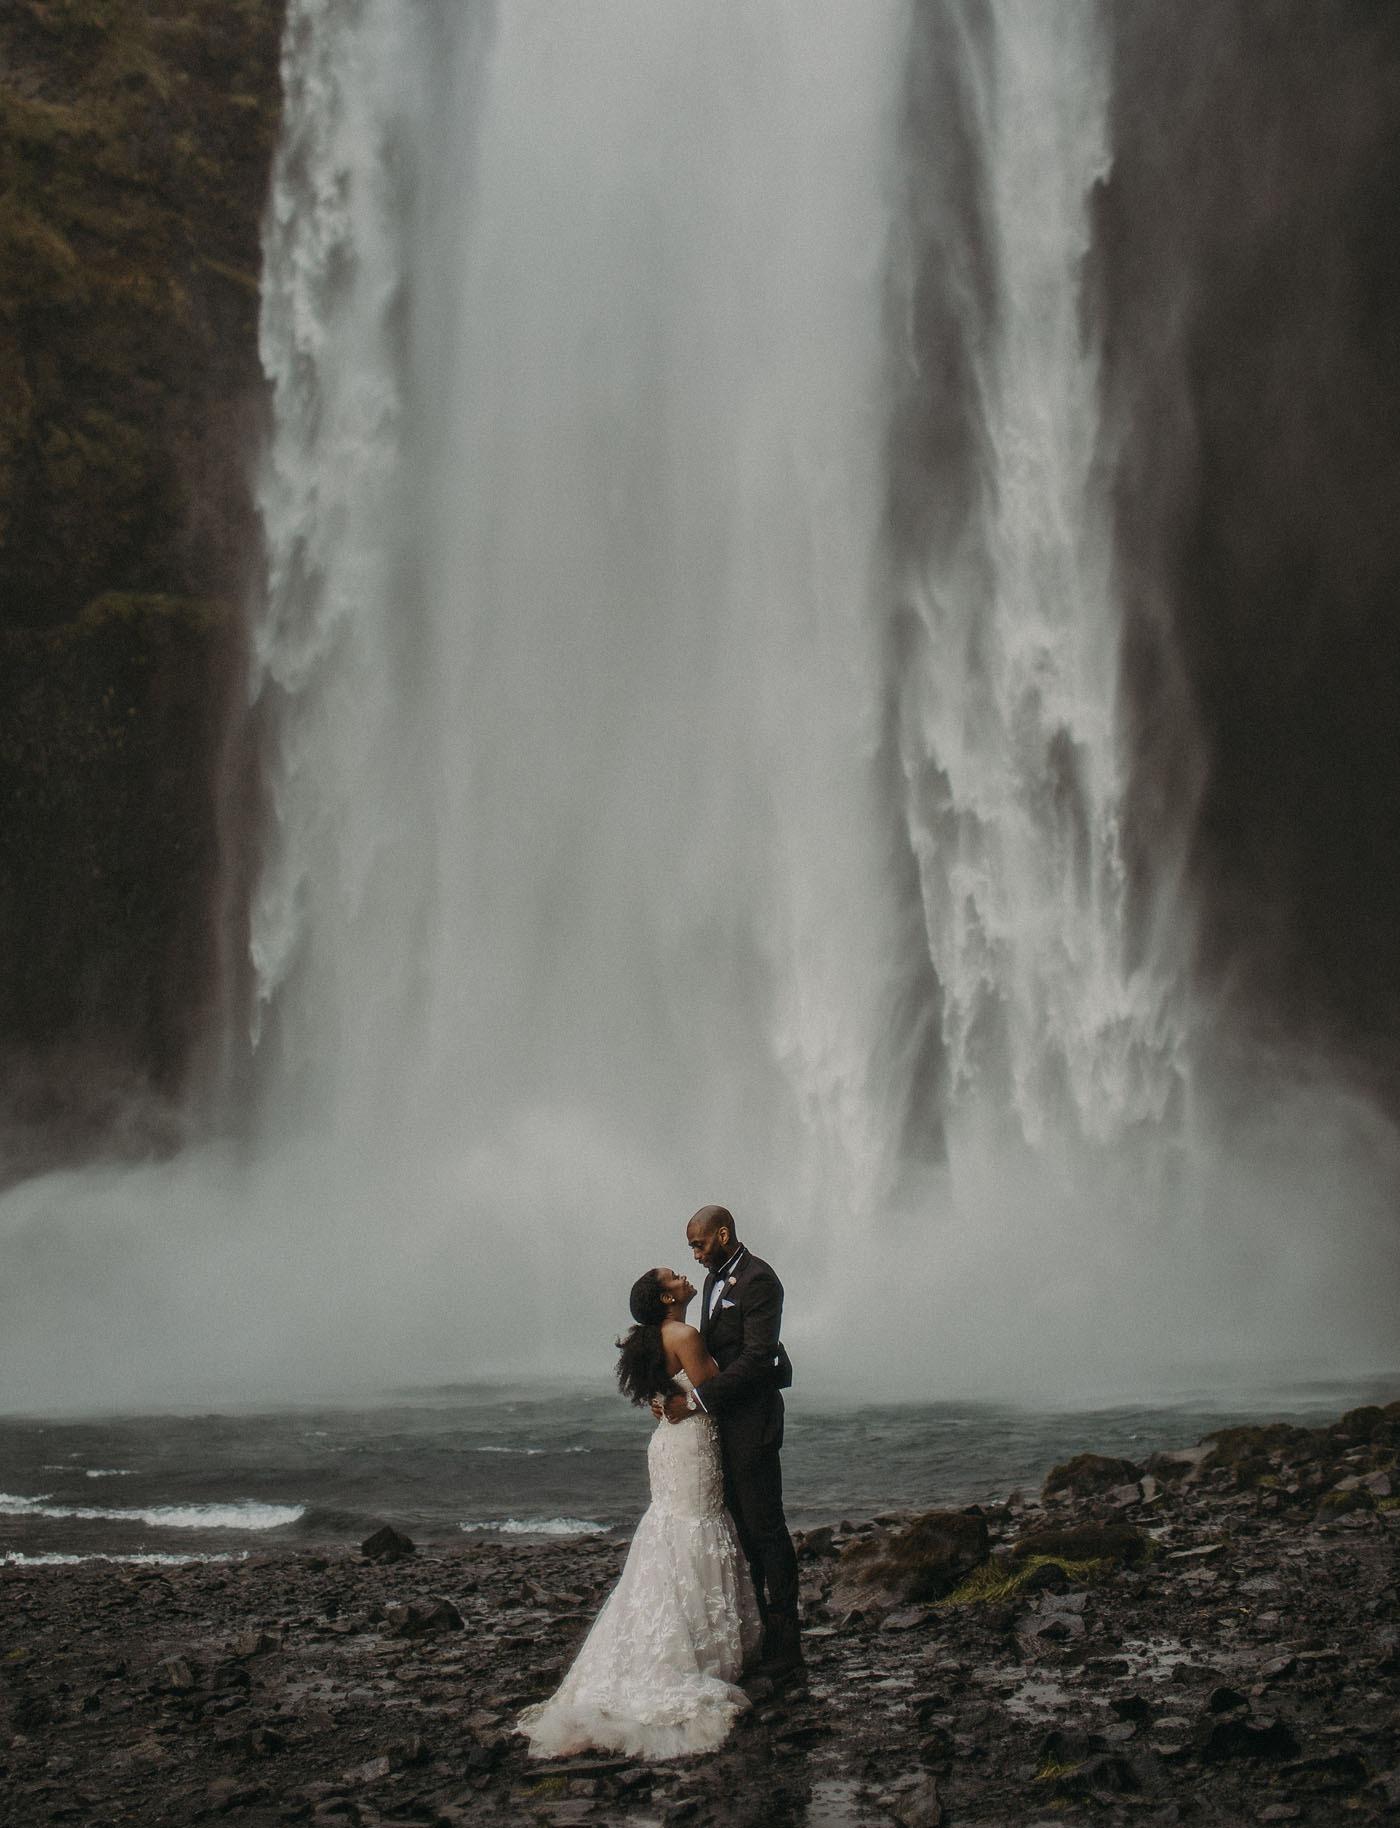 waterfall destination wedding in Iceland